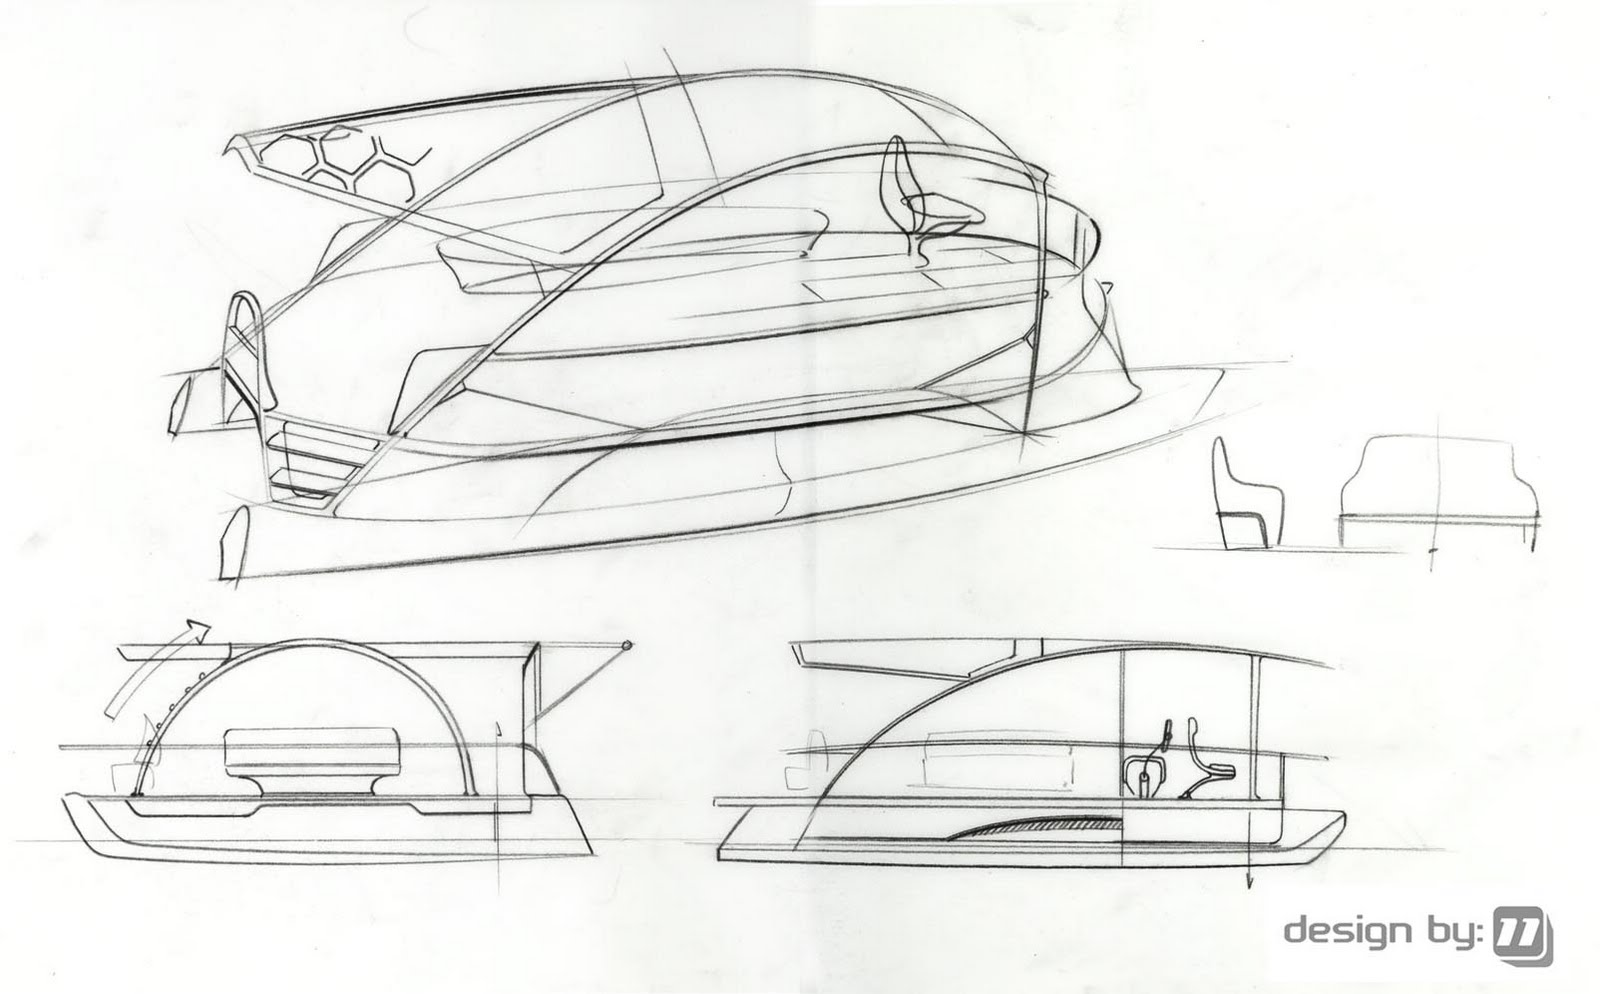 Designby11 June